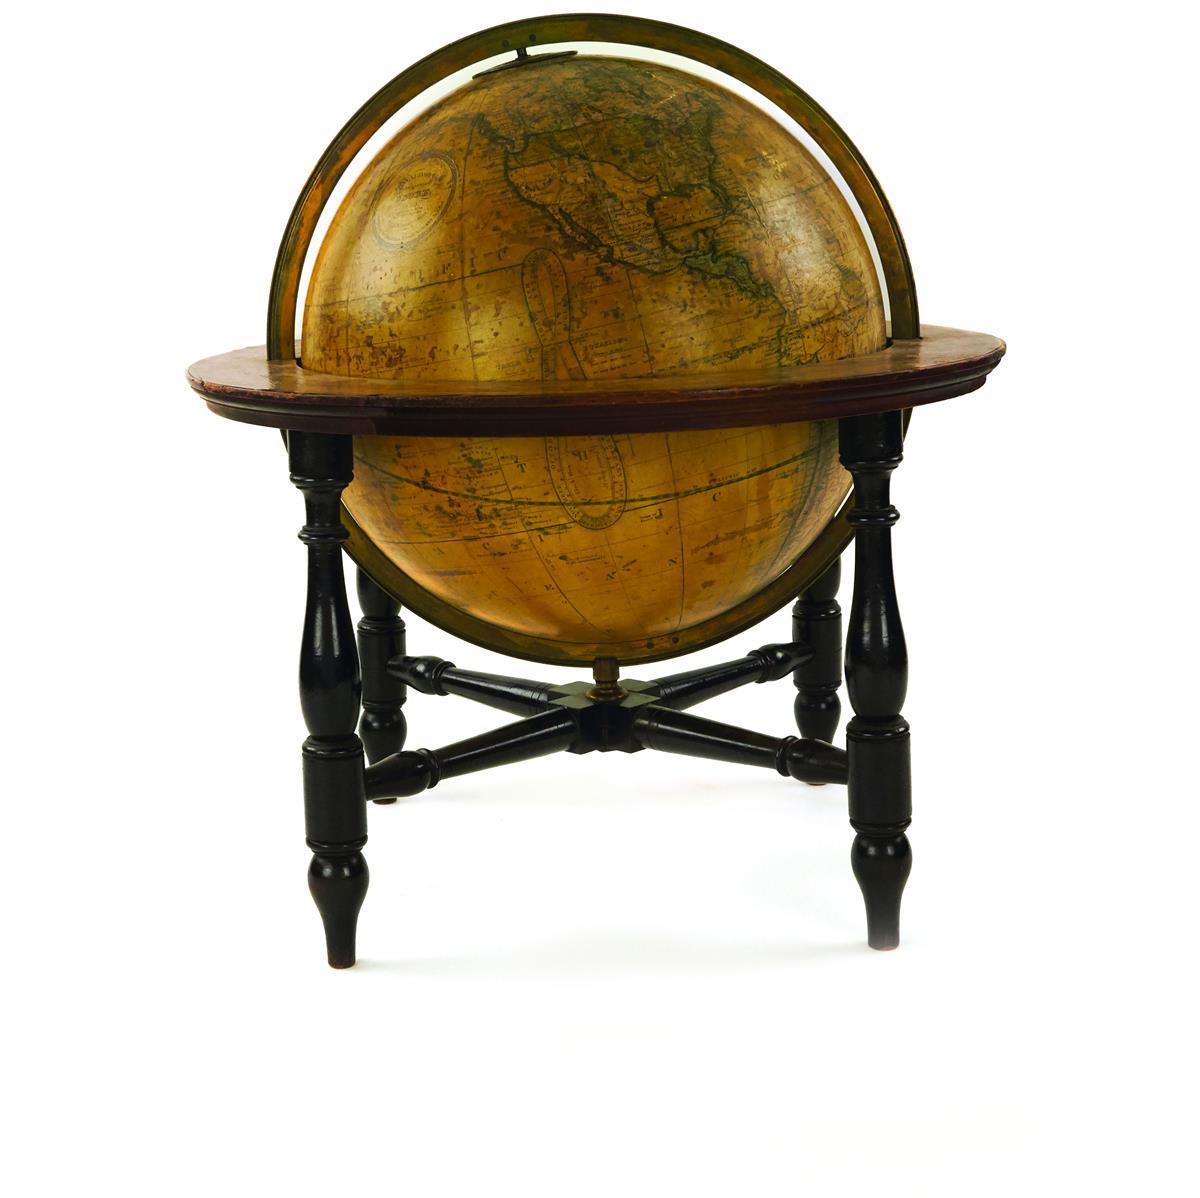 (GLOBES.) W. & A.K. Johnston, engraver. Donaldsons Terrestrial Globe.